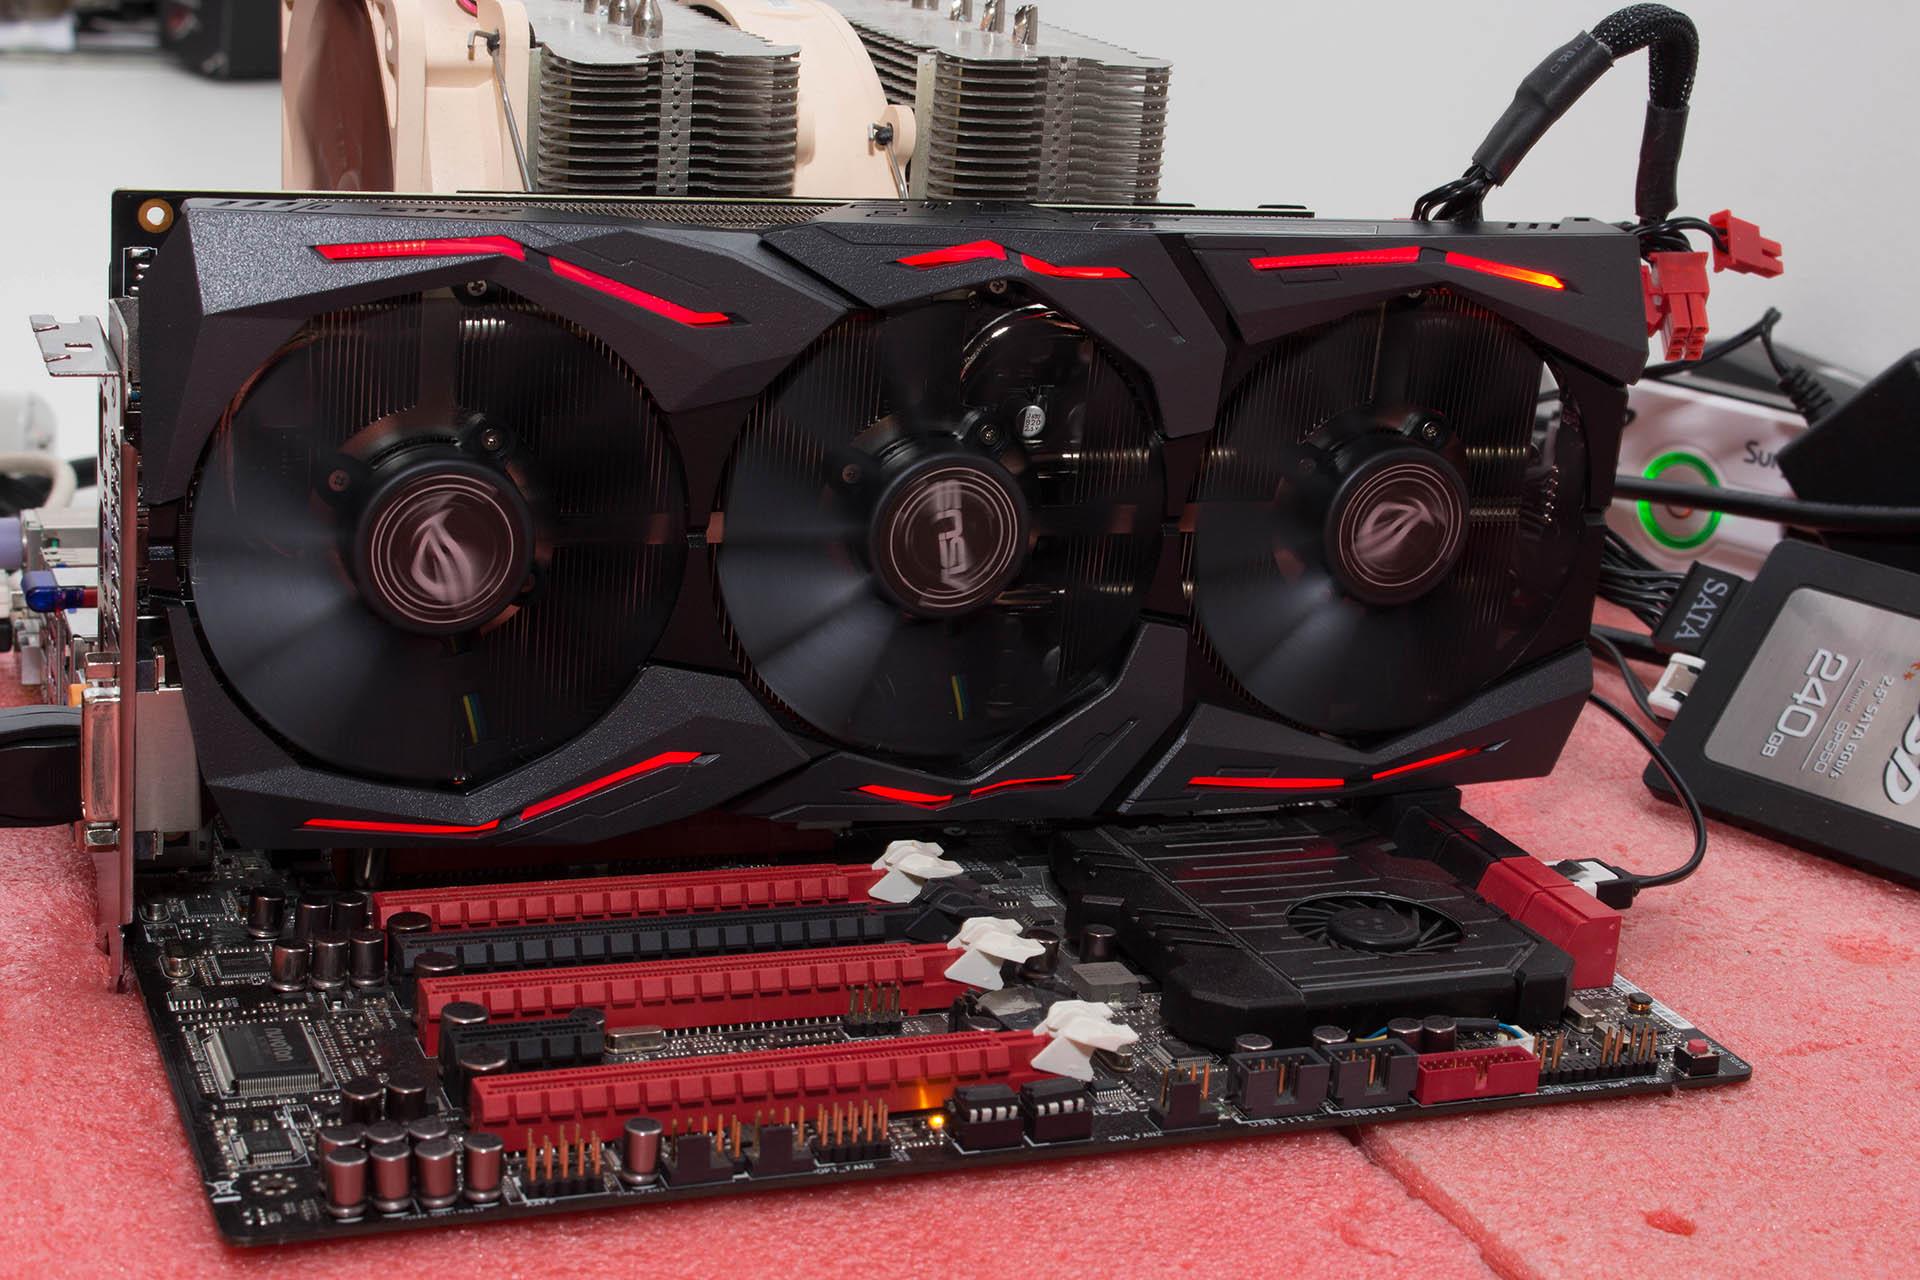 ASUS GTX1060 STRIX vs. Gigabyte GTX1060 Gaming G1